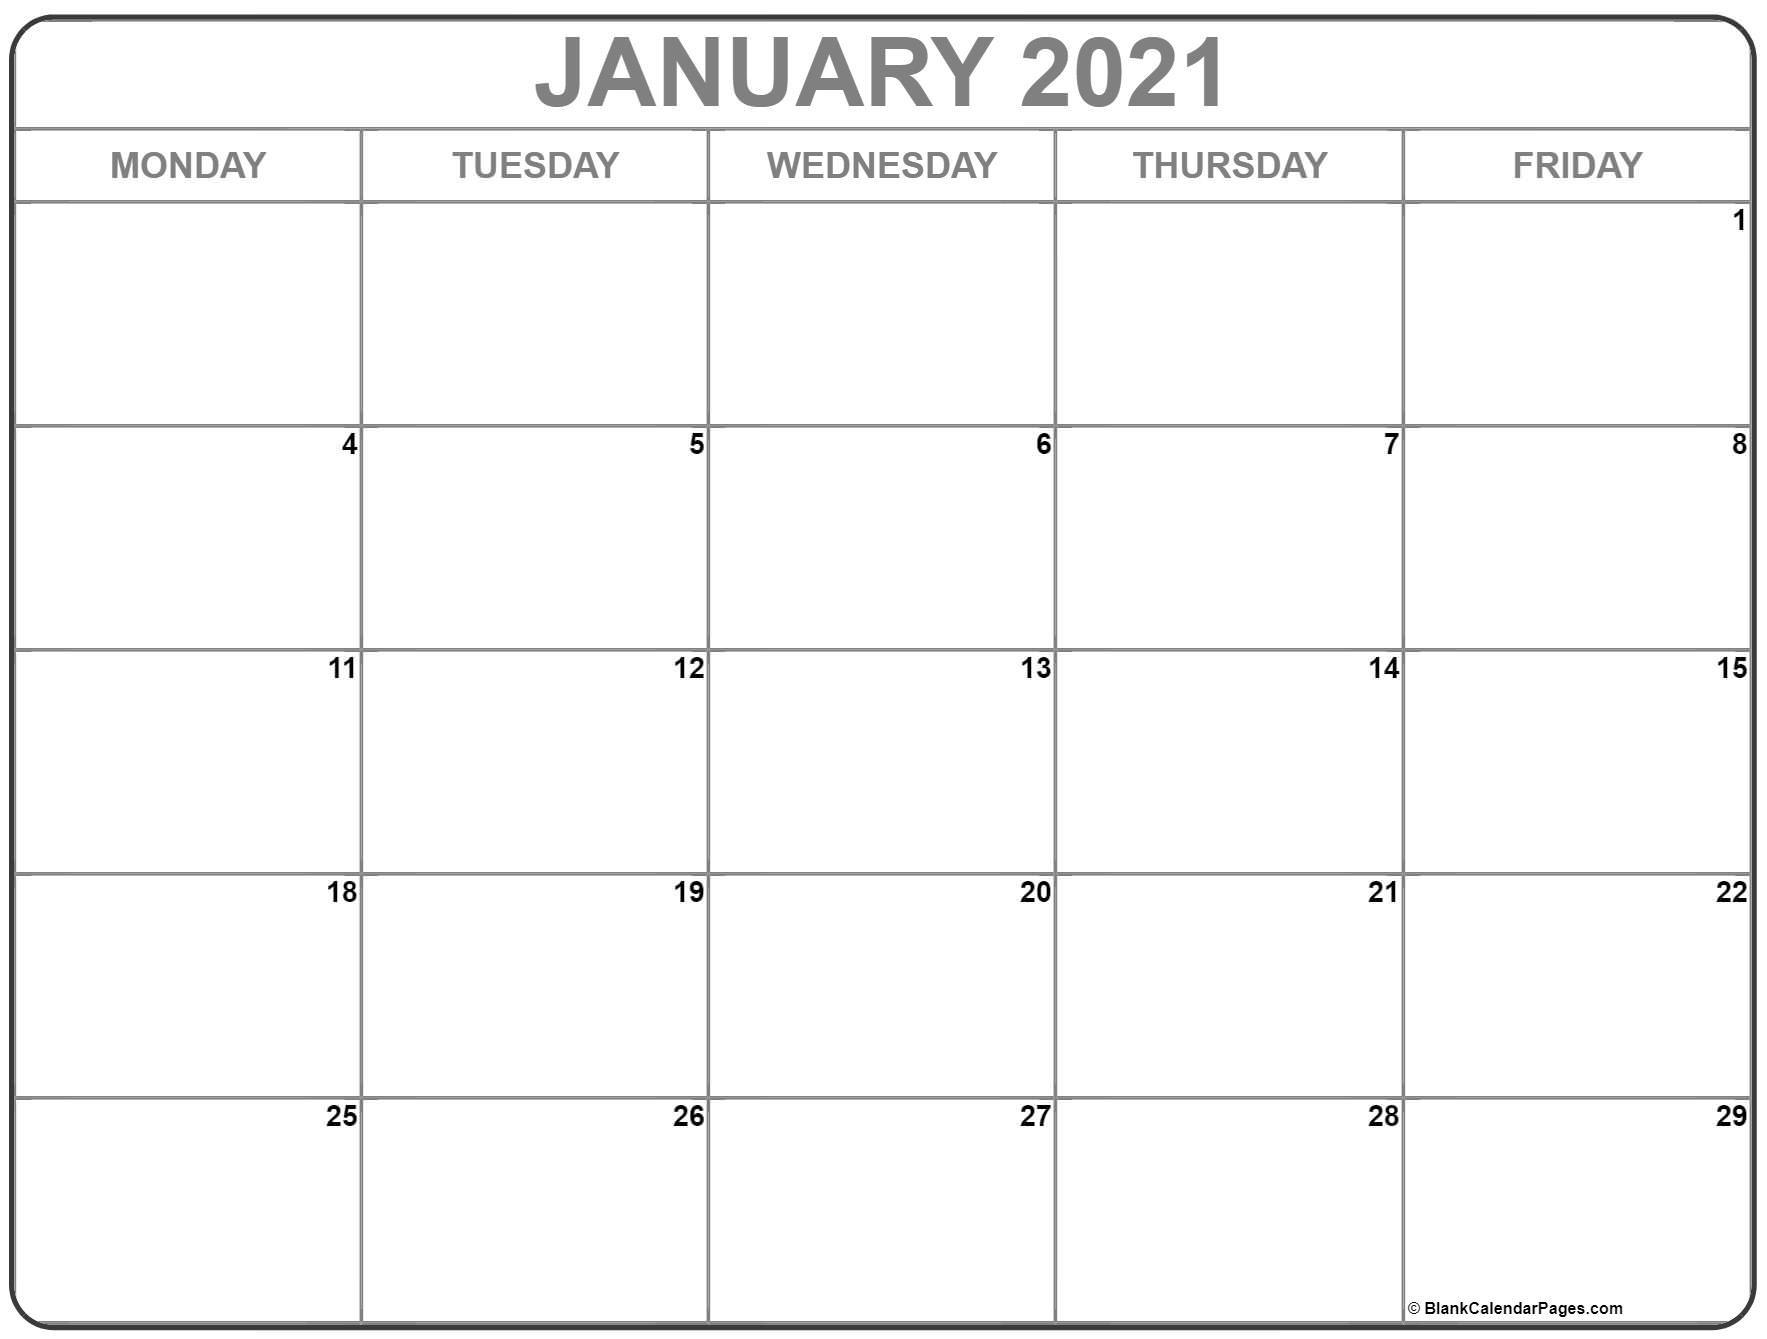 January 2021 Monday Calendar | Monday To Sunday-2021 Calendar That Shows Only Monday Through Friday